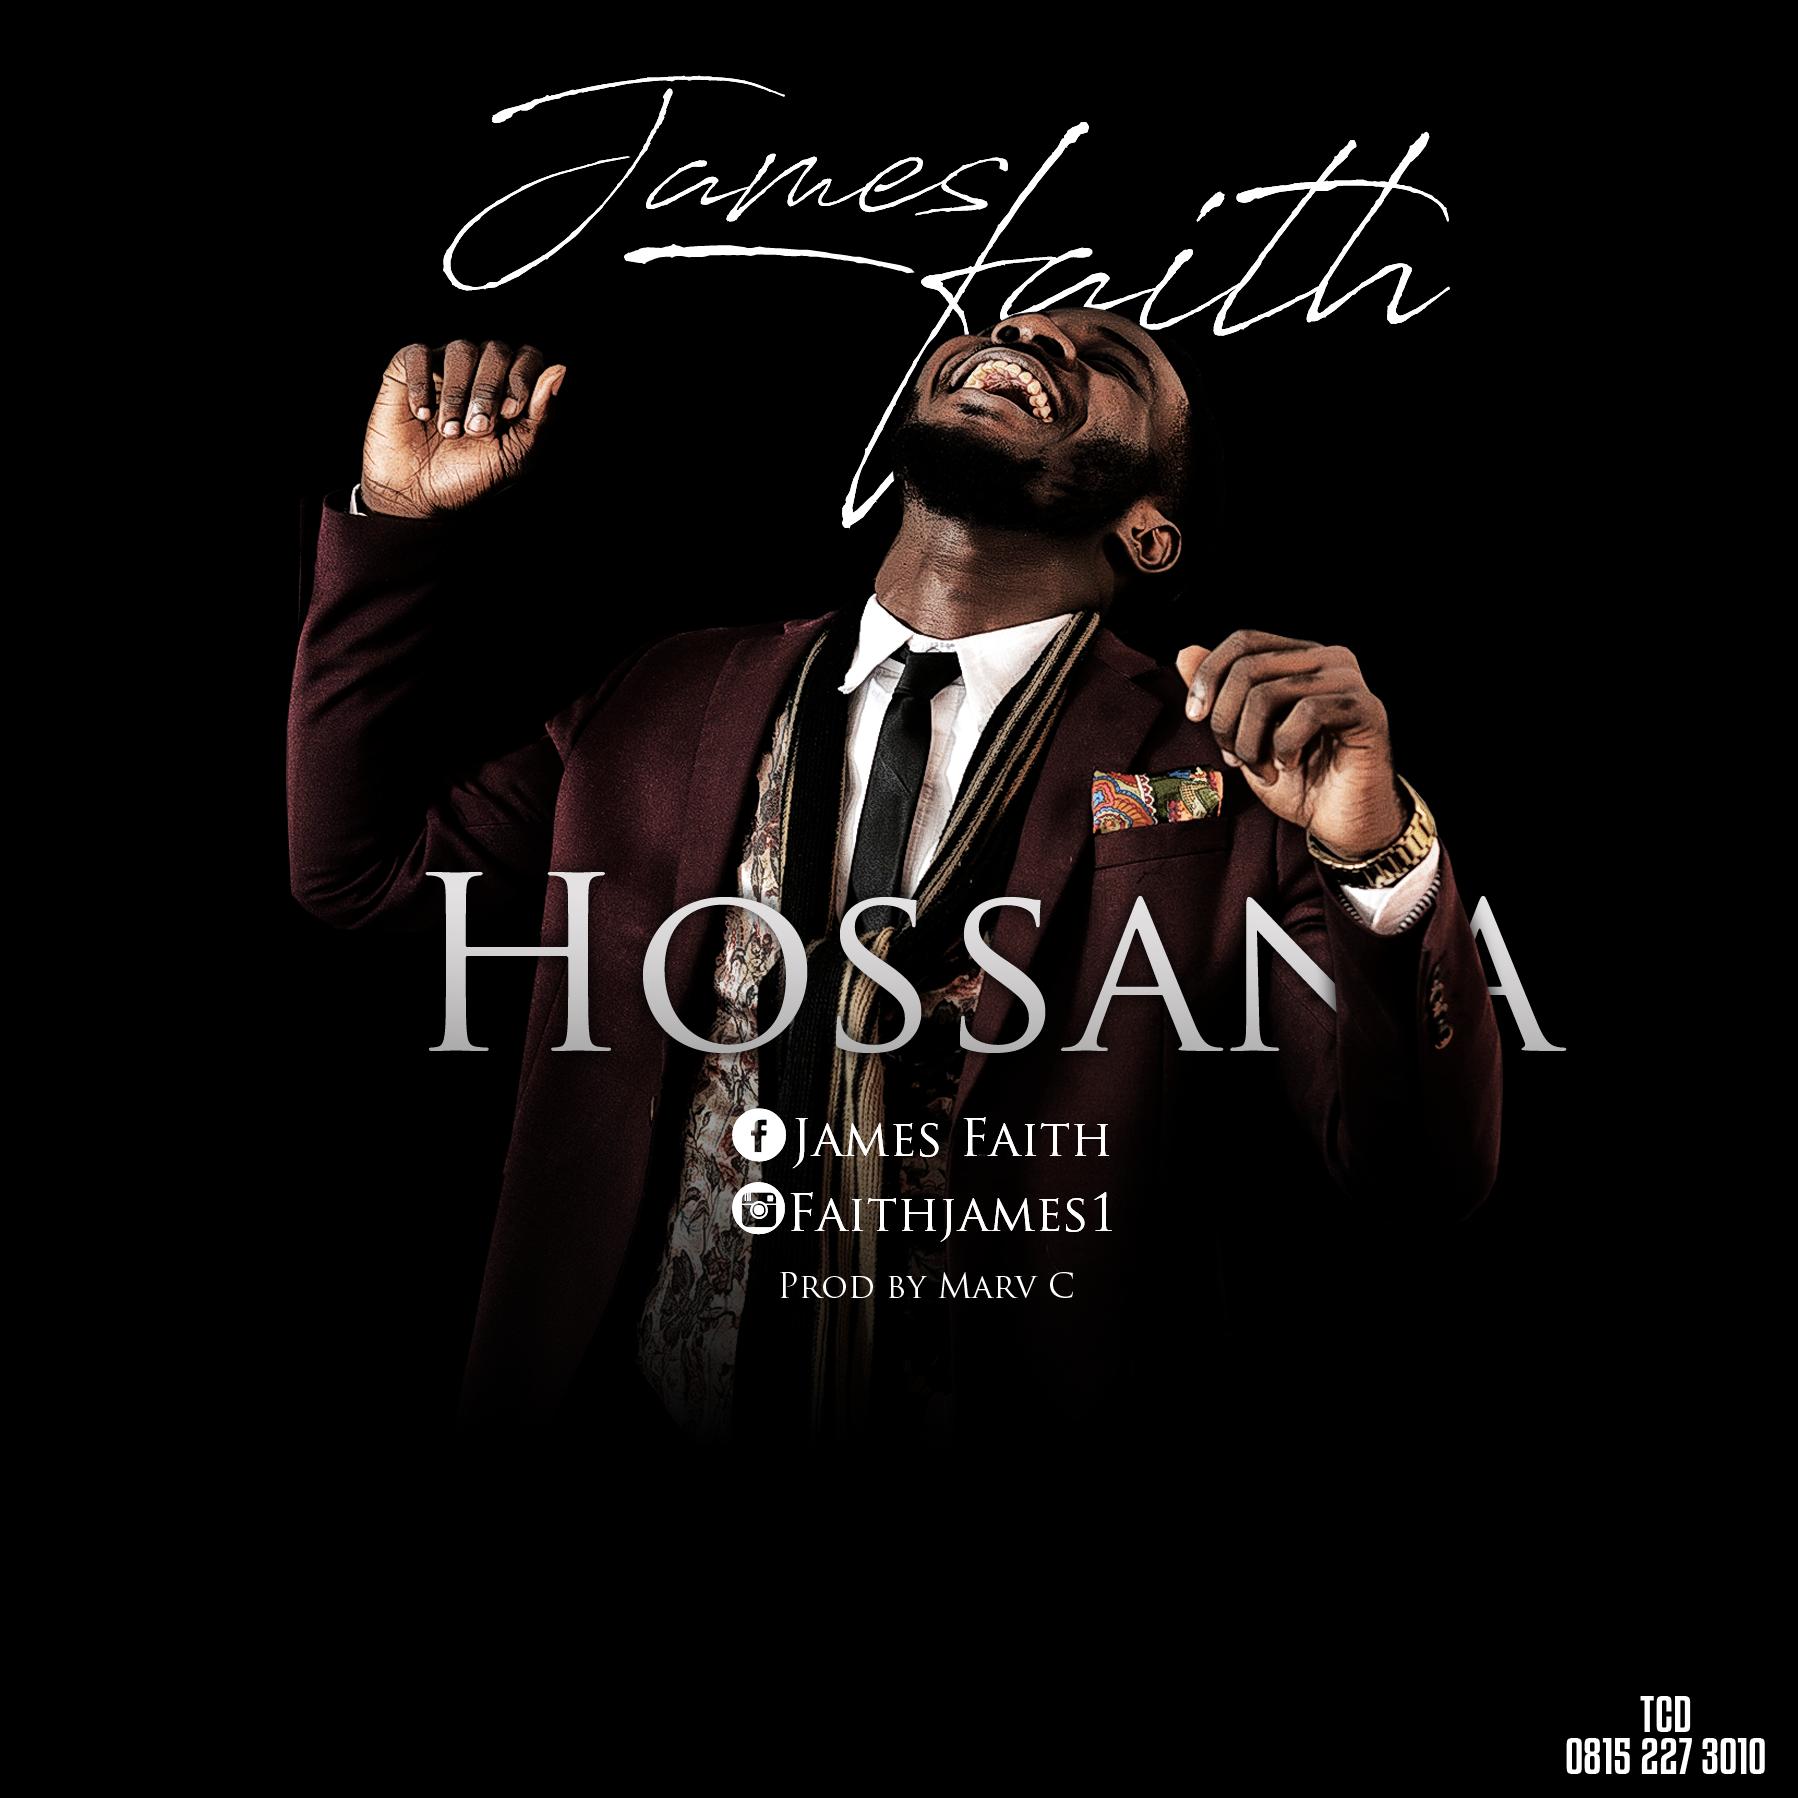 Felsebiyat Dergisi – Popular Hosanna Hillsong Free Mp3 Download